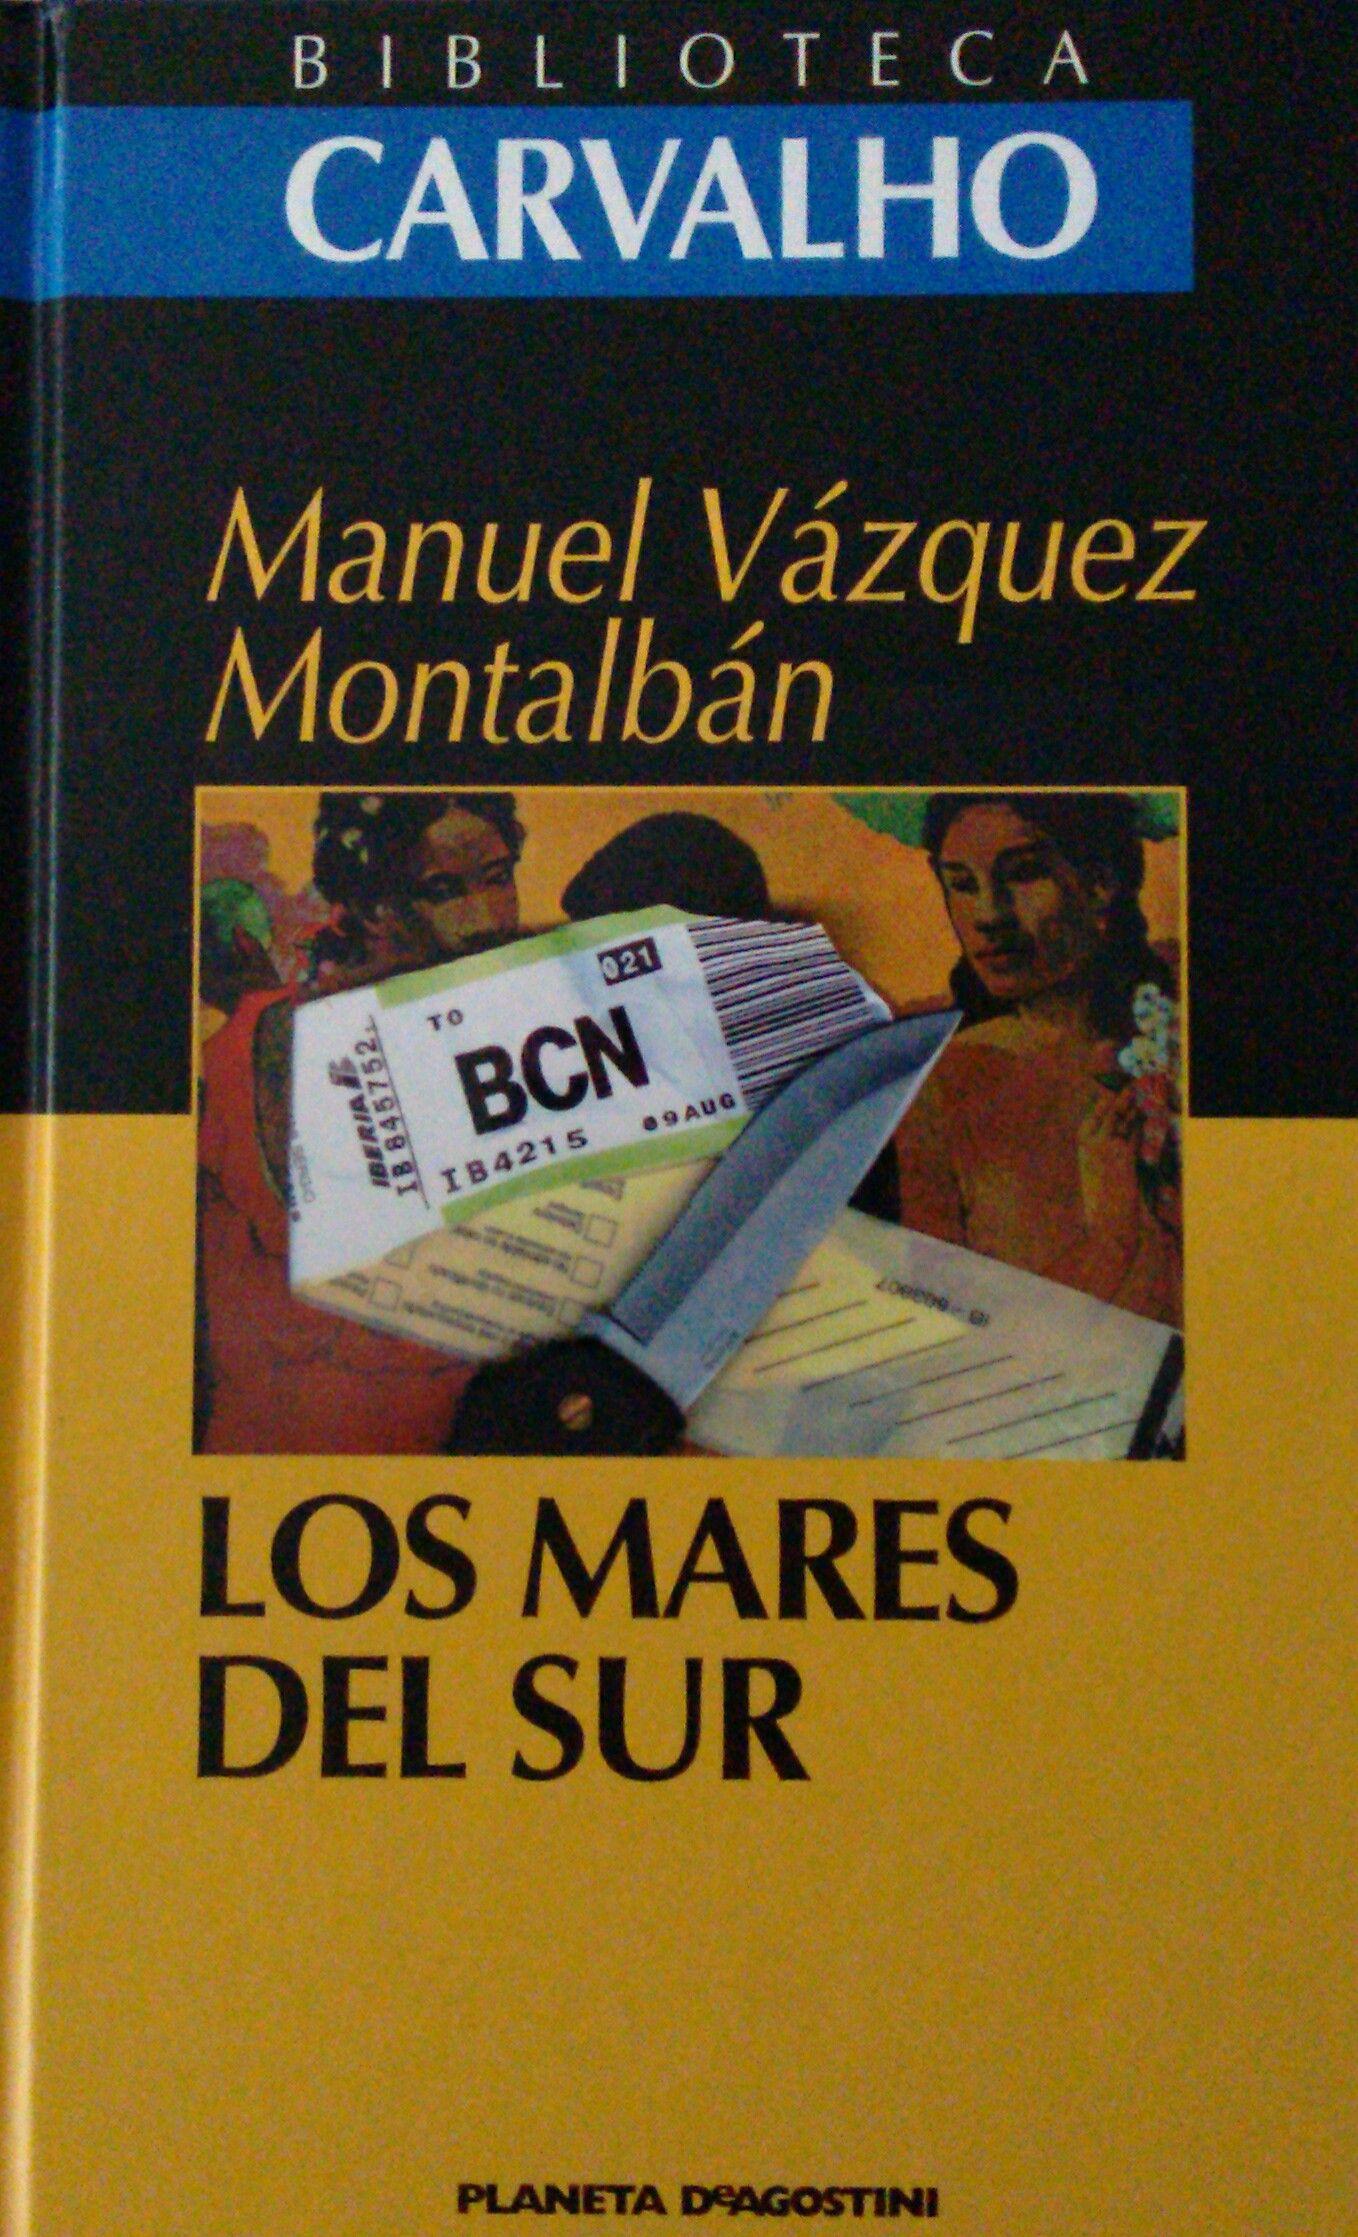 Los Mares Del Sur Manuel Vázquez Montalbán Portadas Planeta Deagostini Vazquez